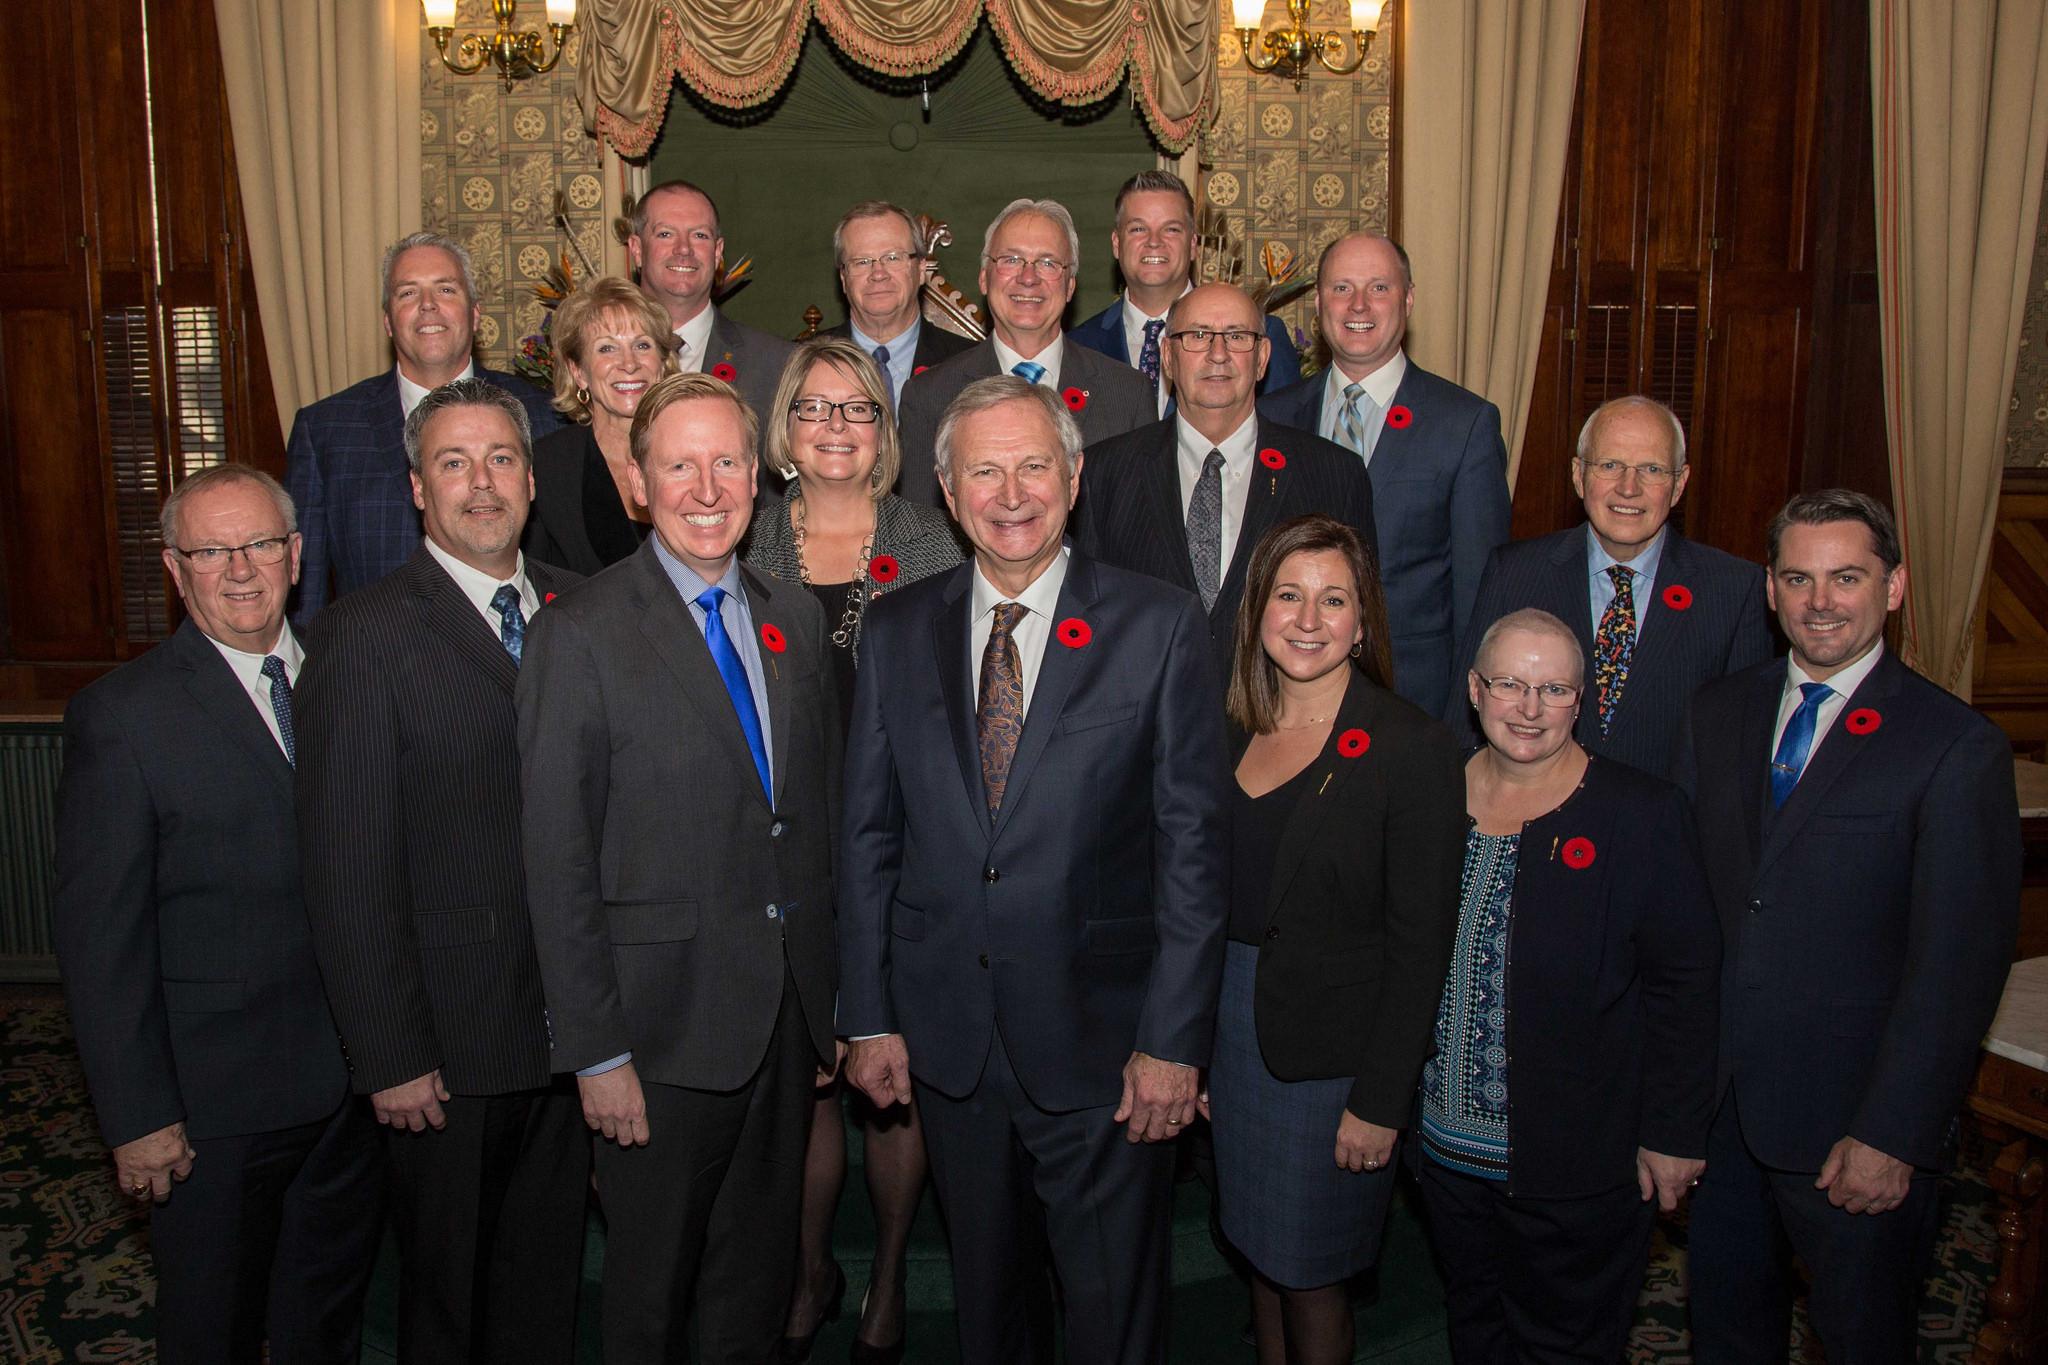 Higgs sworn in as 34th premier of New Brunswick